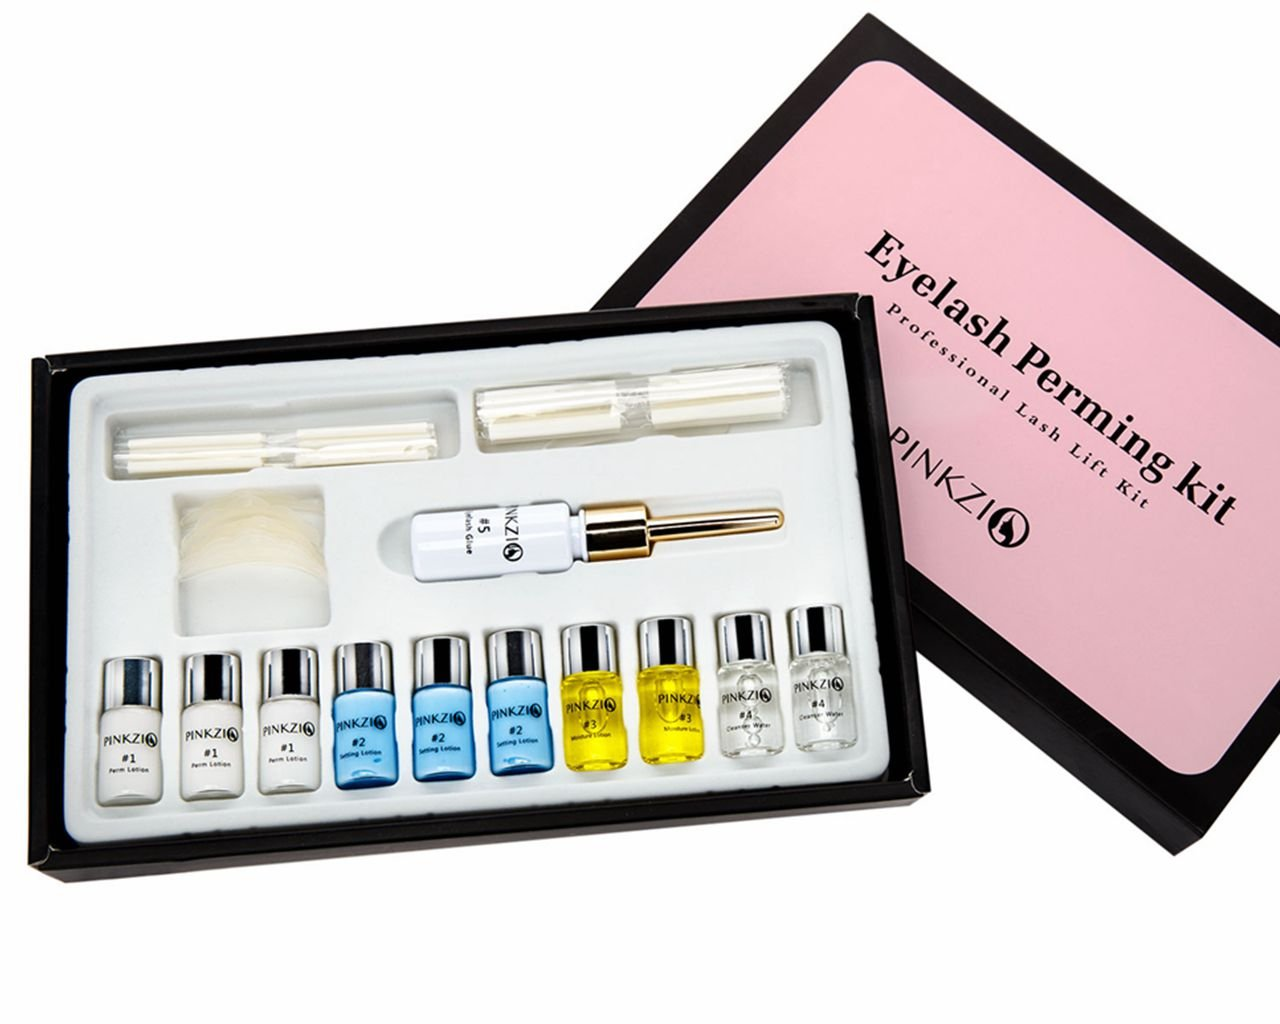 Pinkzio Premium Eyelash Perm Kit Full Eyelash Lift Kit For Professional Use, 15 in 1 Salon Lashlift Eyelash Perming kit by PINKZIO